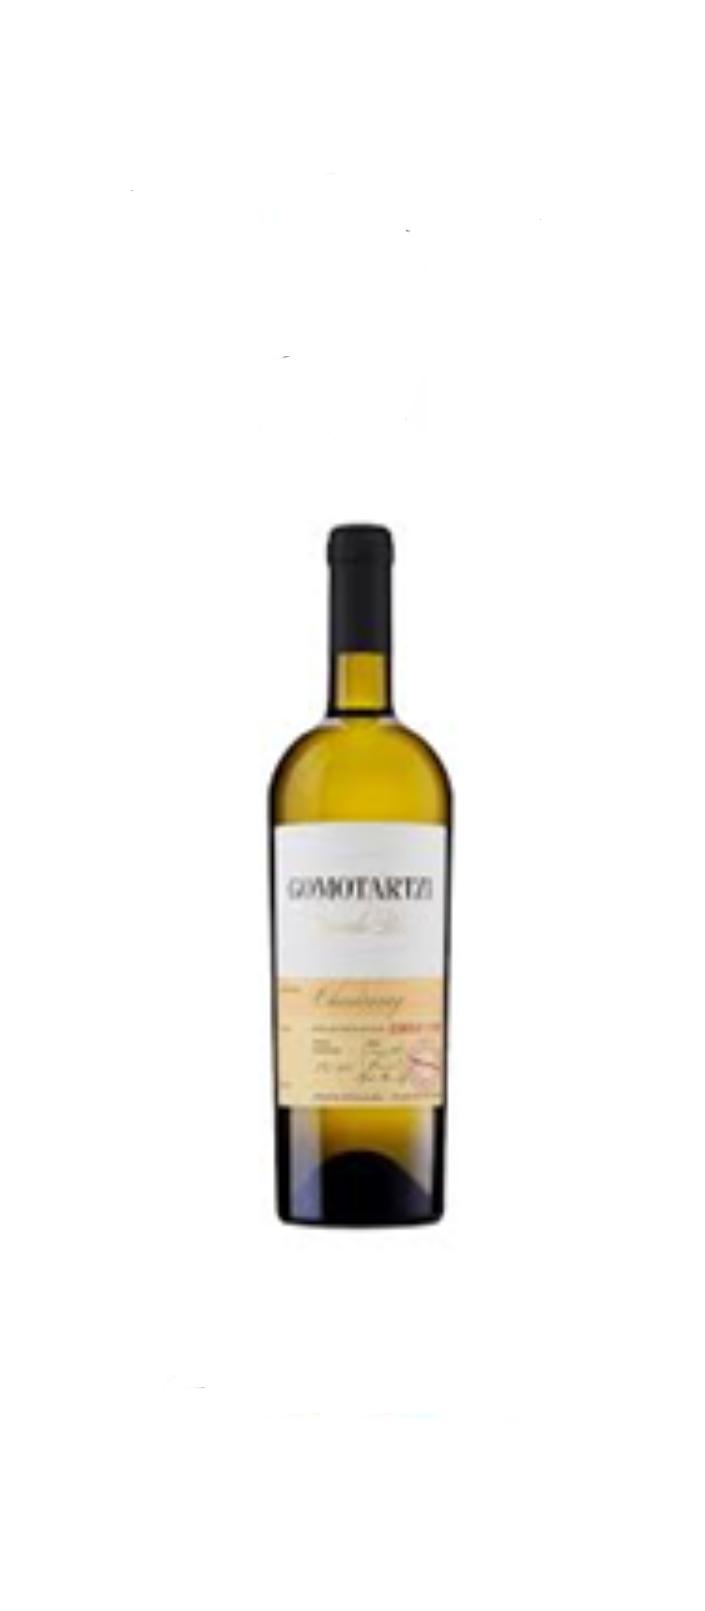 Bononia Chardonnay 2018